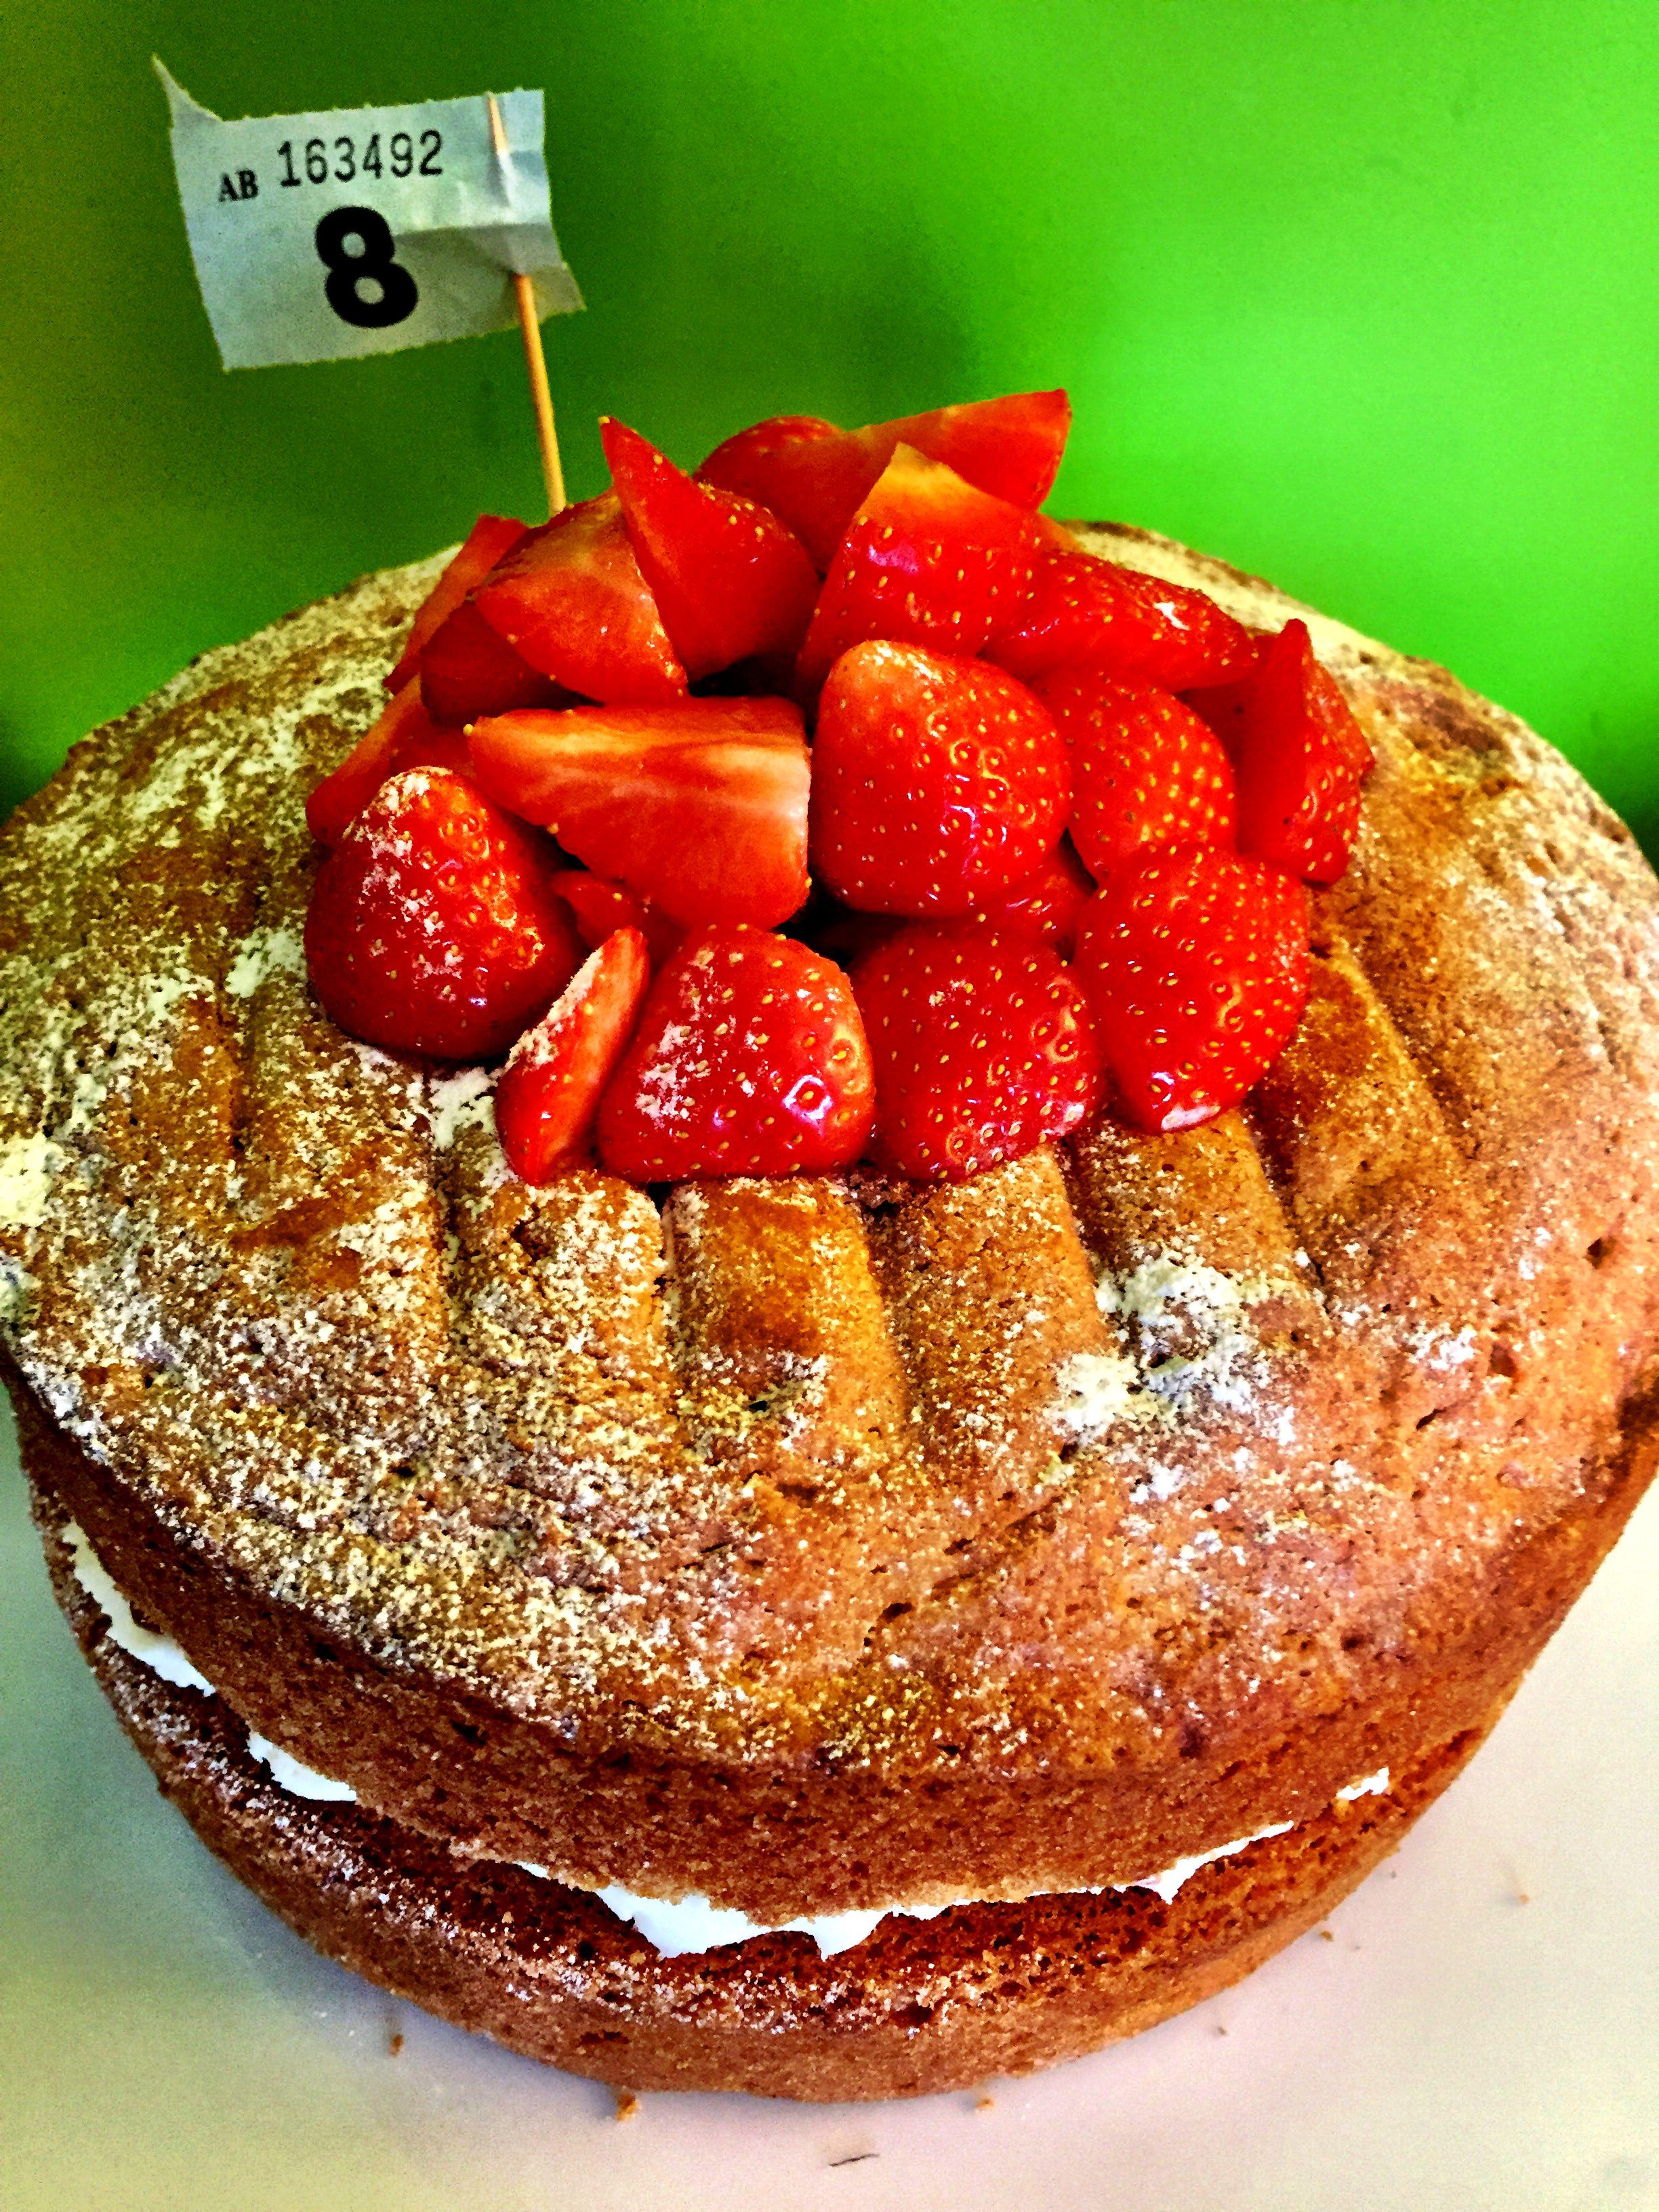 Mack Jenkins' winning cake